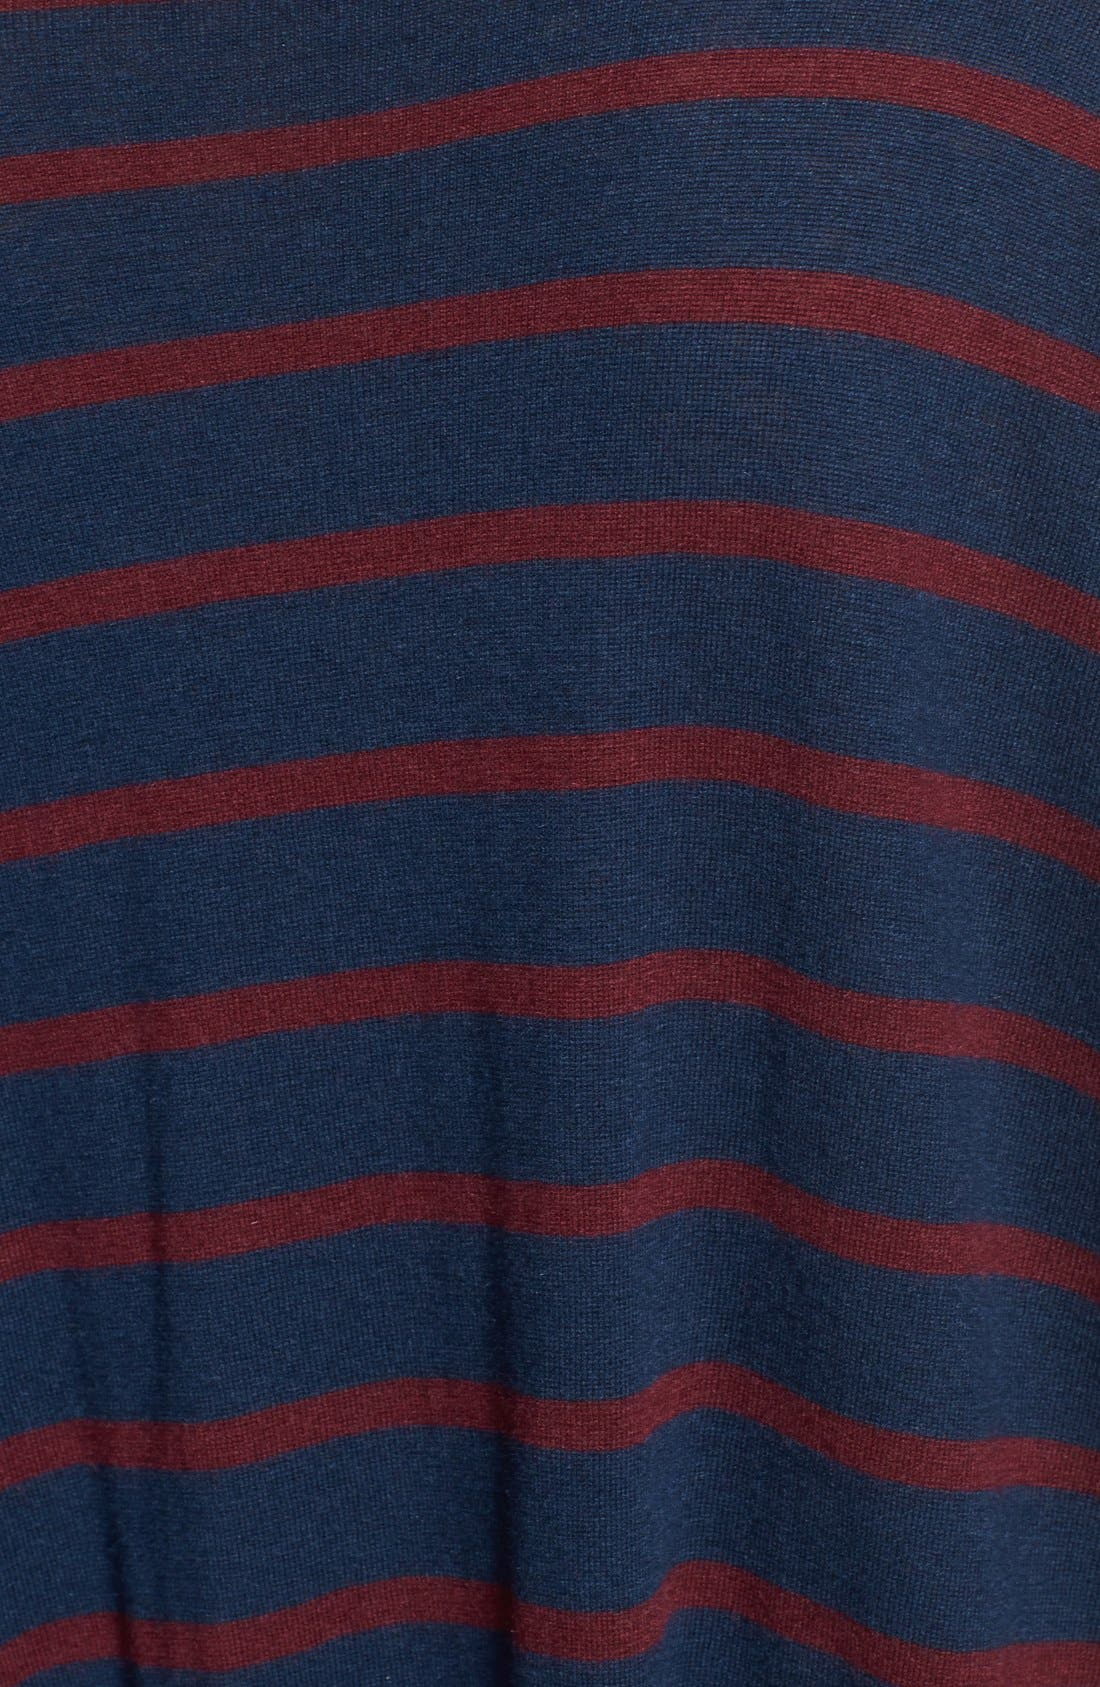 Alternate Image 3  - Splendid 'Upton' Space Dye Stripe Sweater (Nordstrom Exclusive)